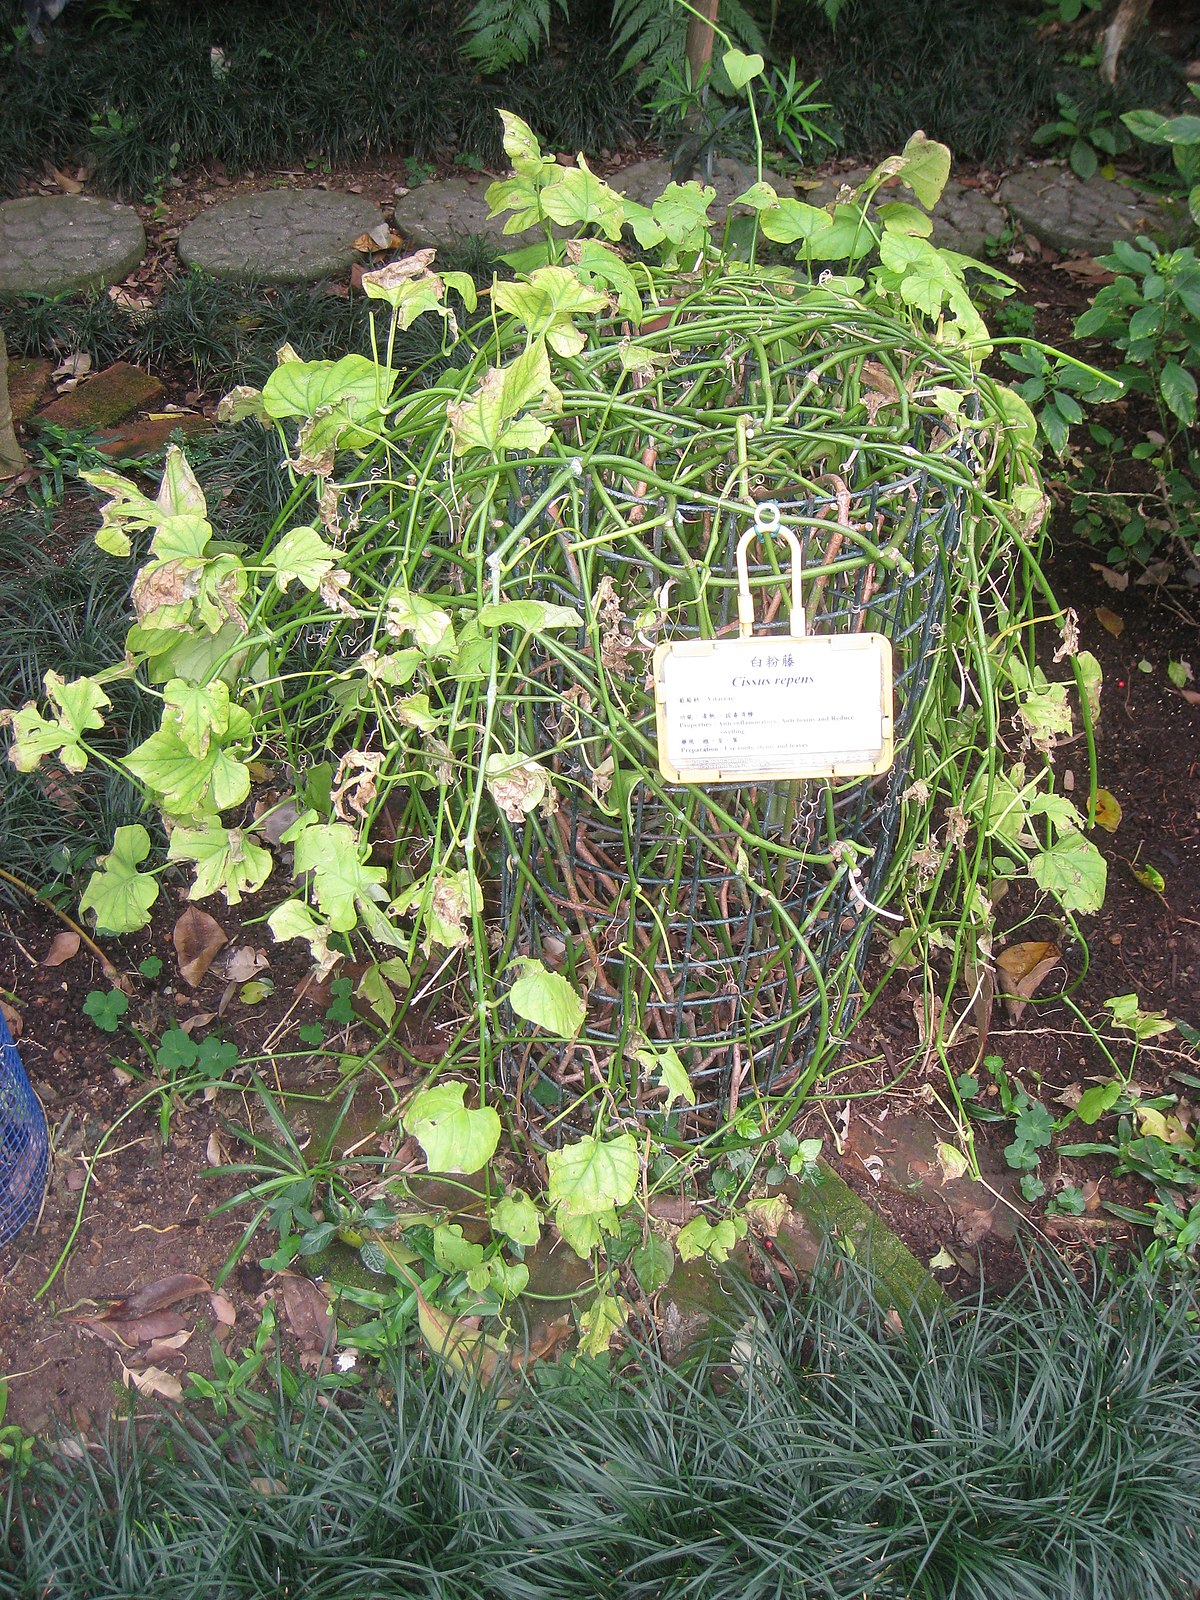 Cissus repens - Wikispecies